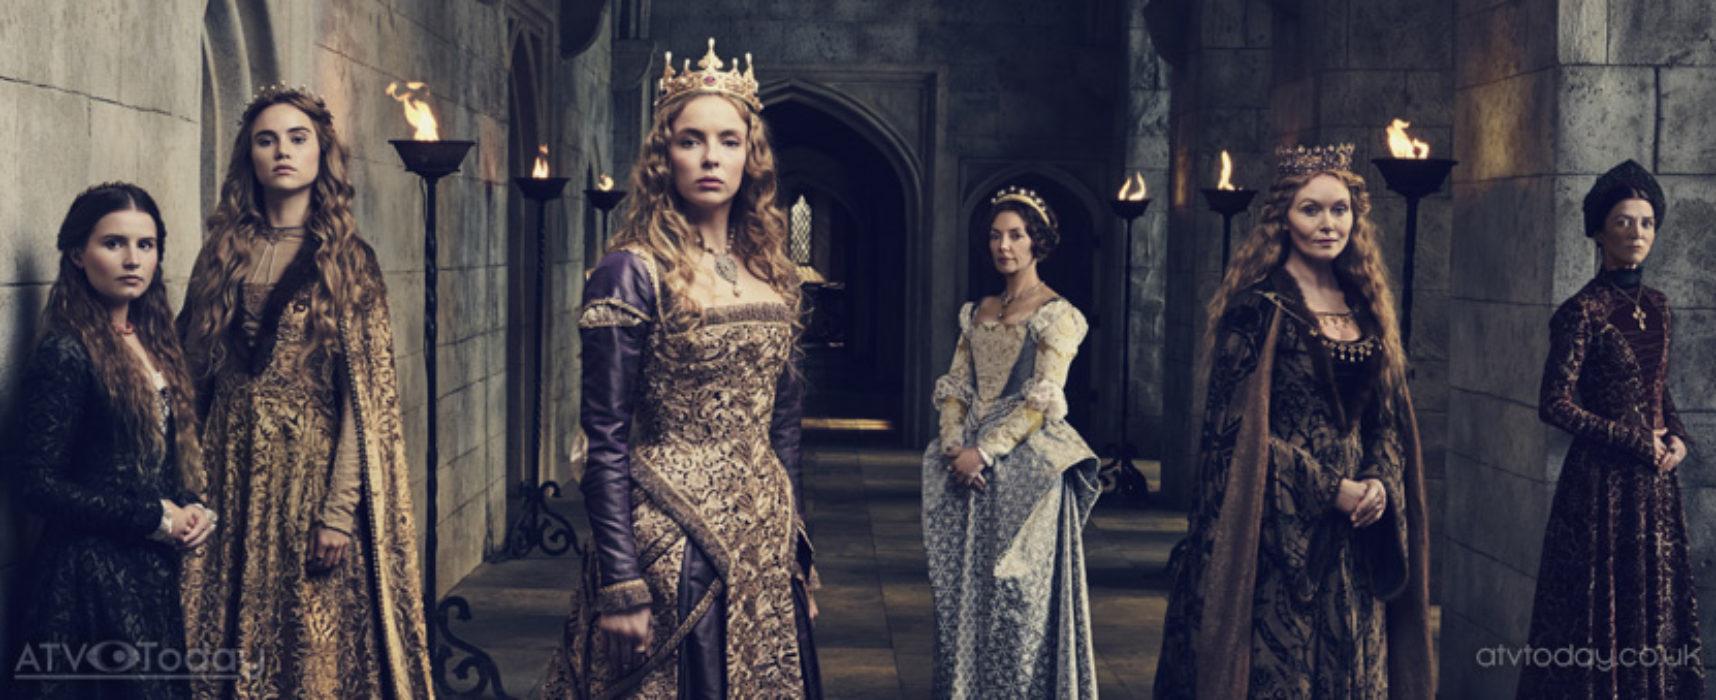 Starz serial The White Princess to air on UKTV channel Drama